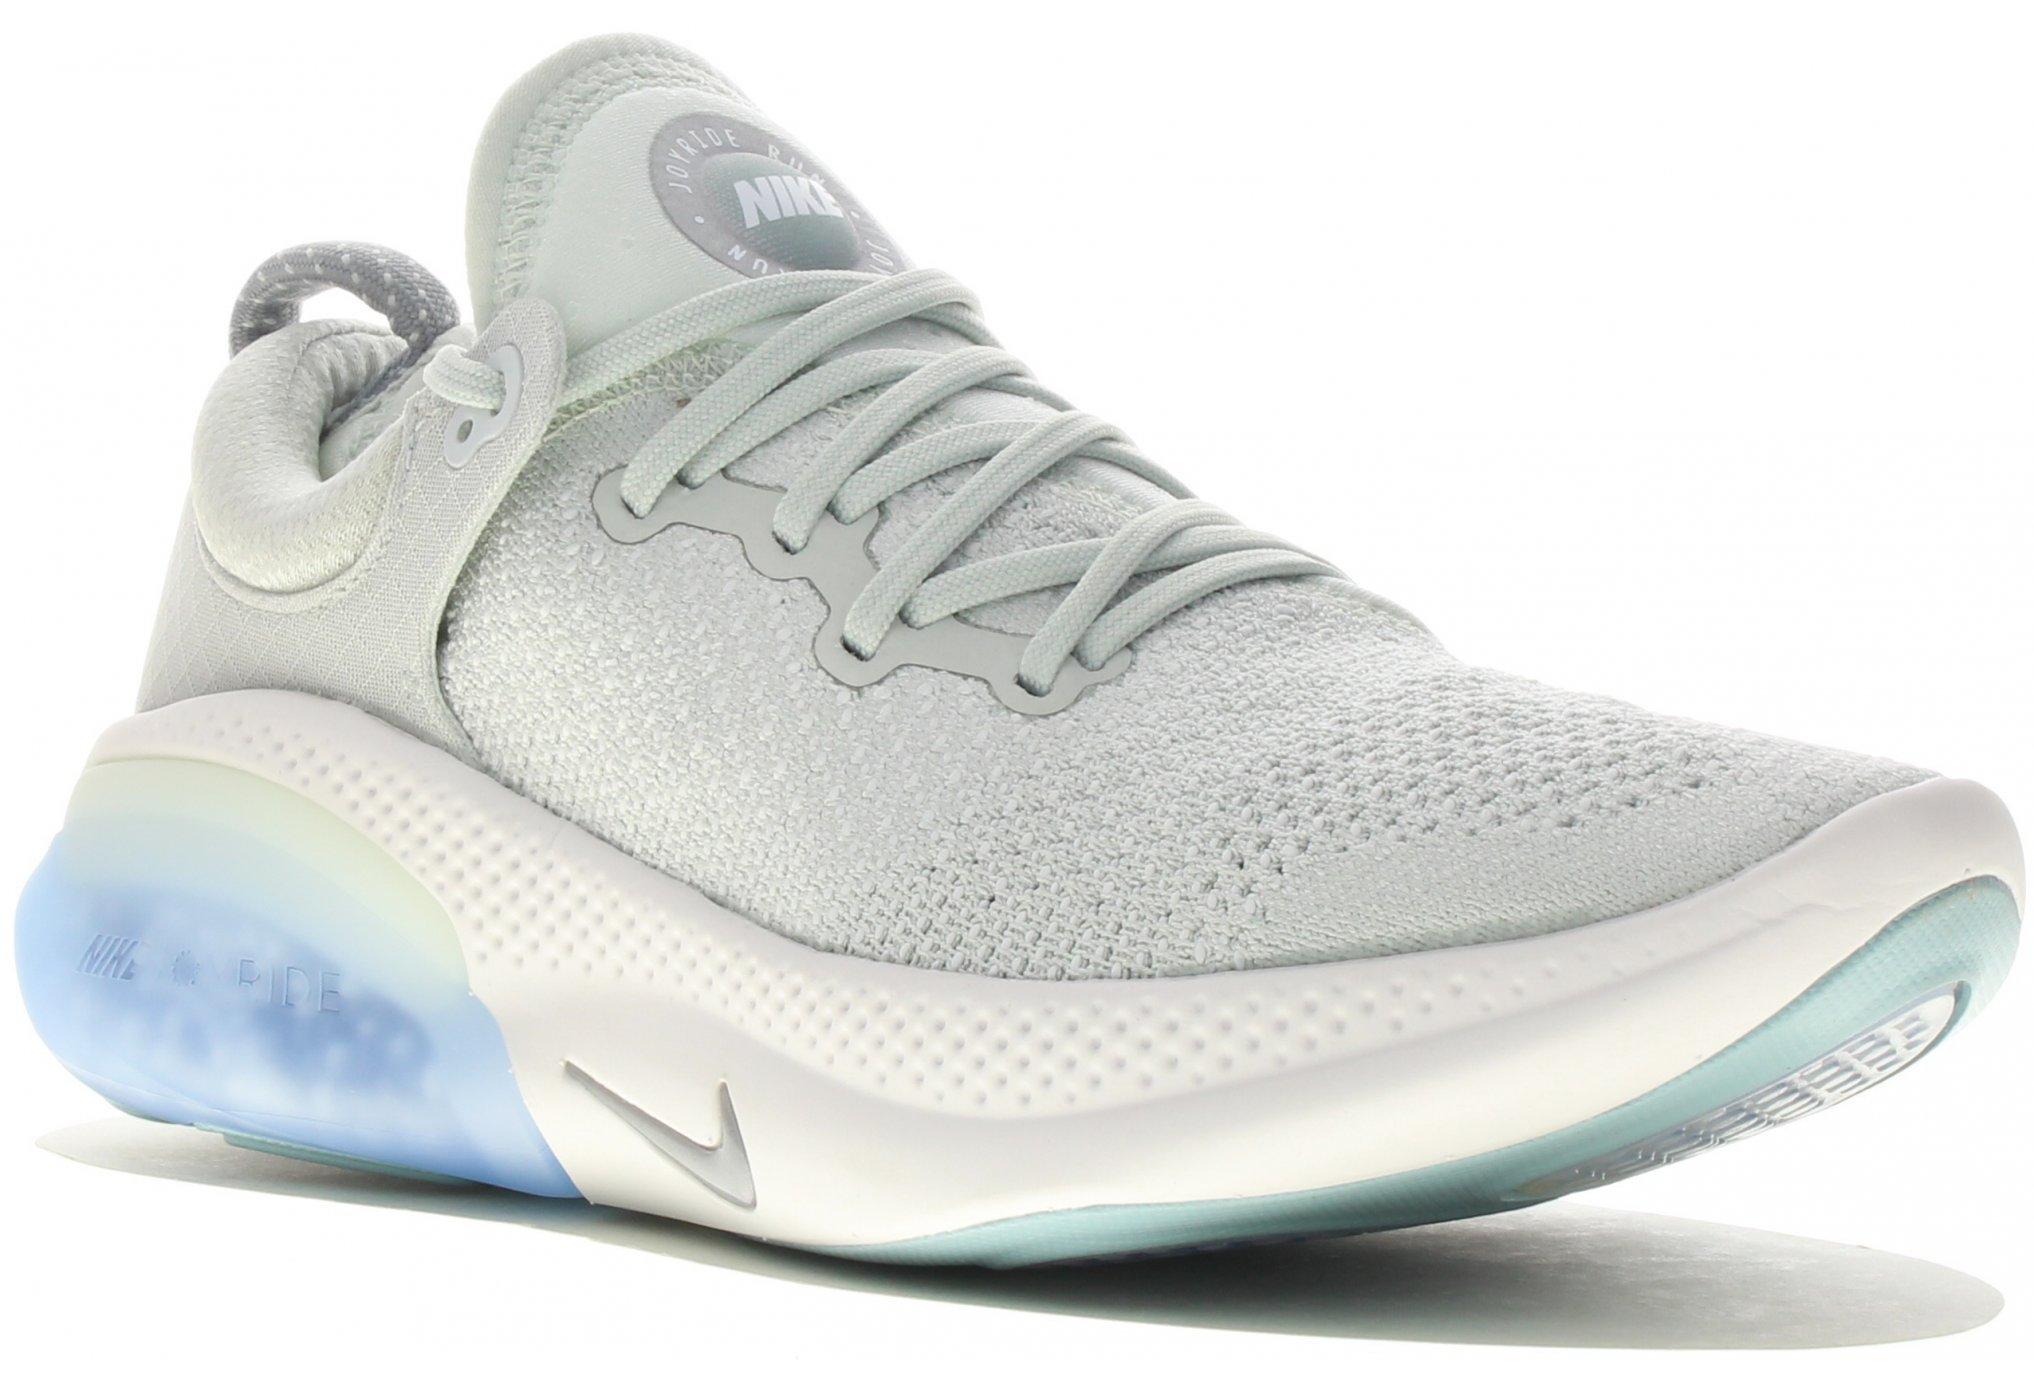 Nike Joyride Run Flyknit W Chaussures running femme